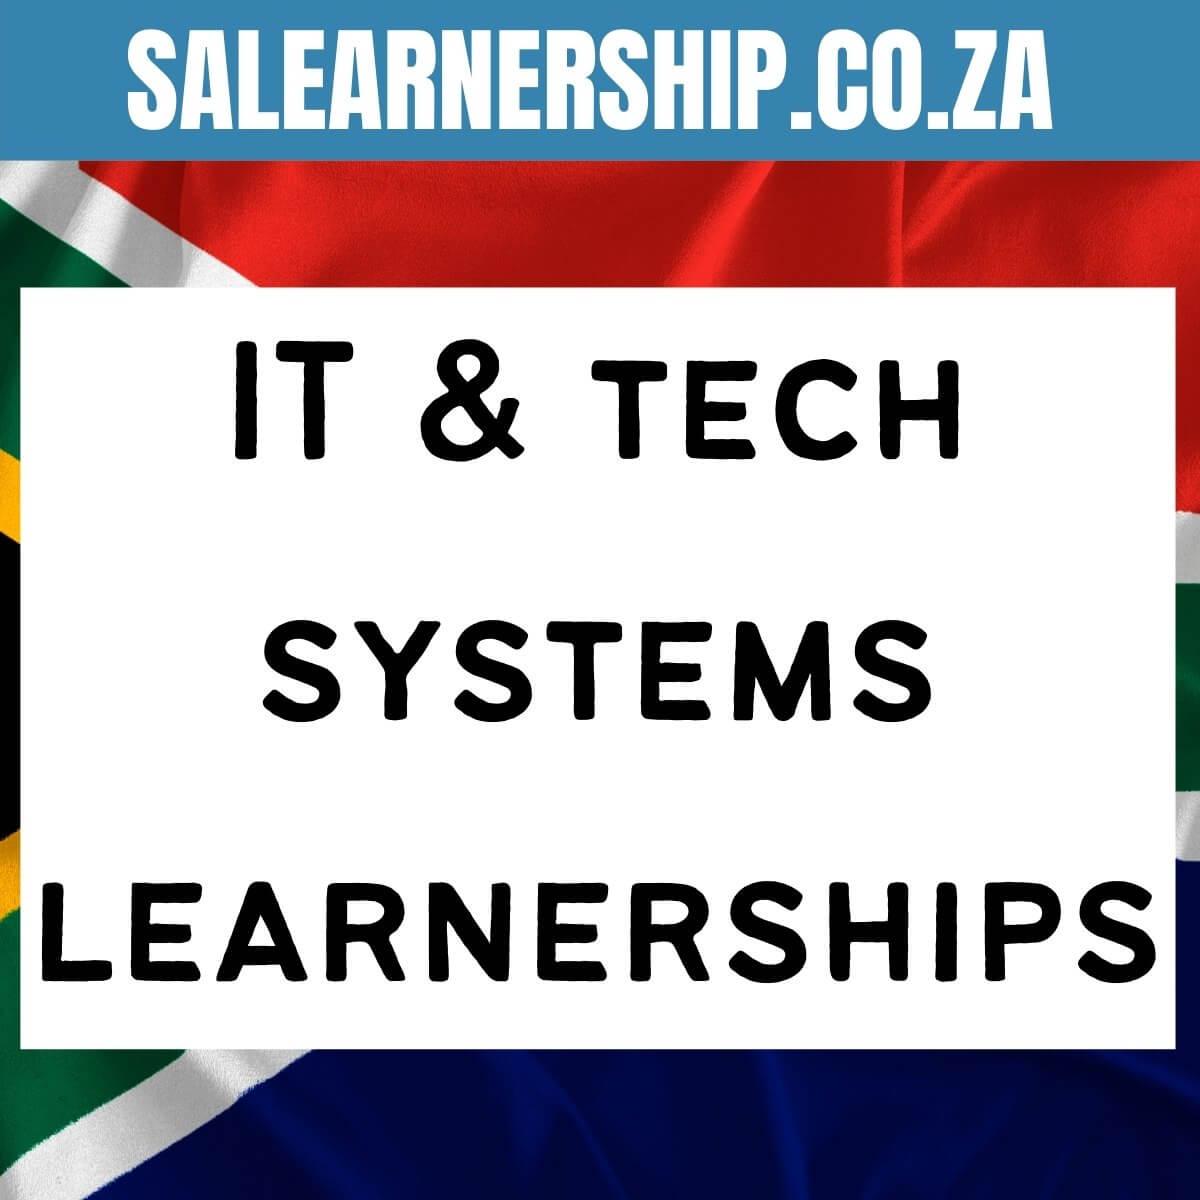 it& tech systems learnerships